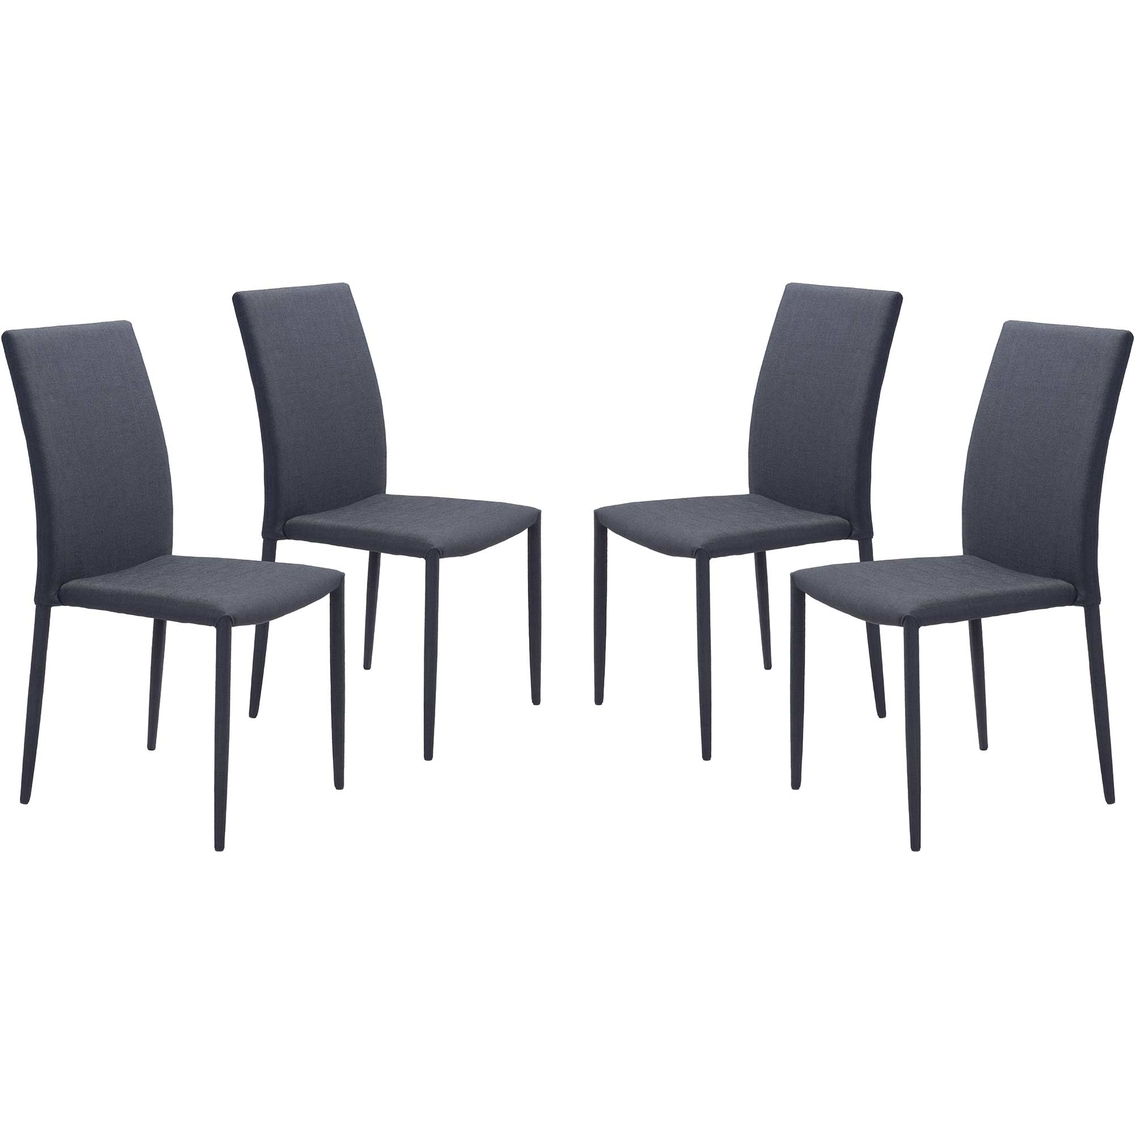 https www shopmyexchange com zuo modern confidence dining chair 4 pk 2439811